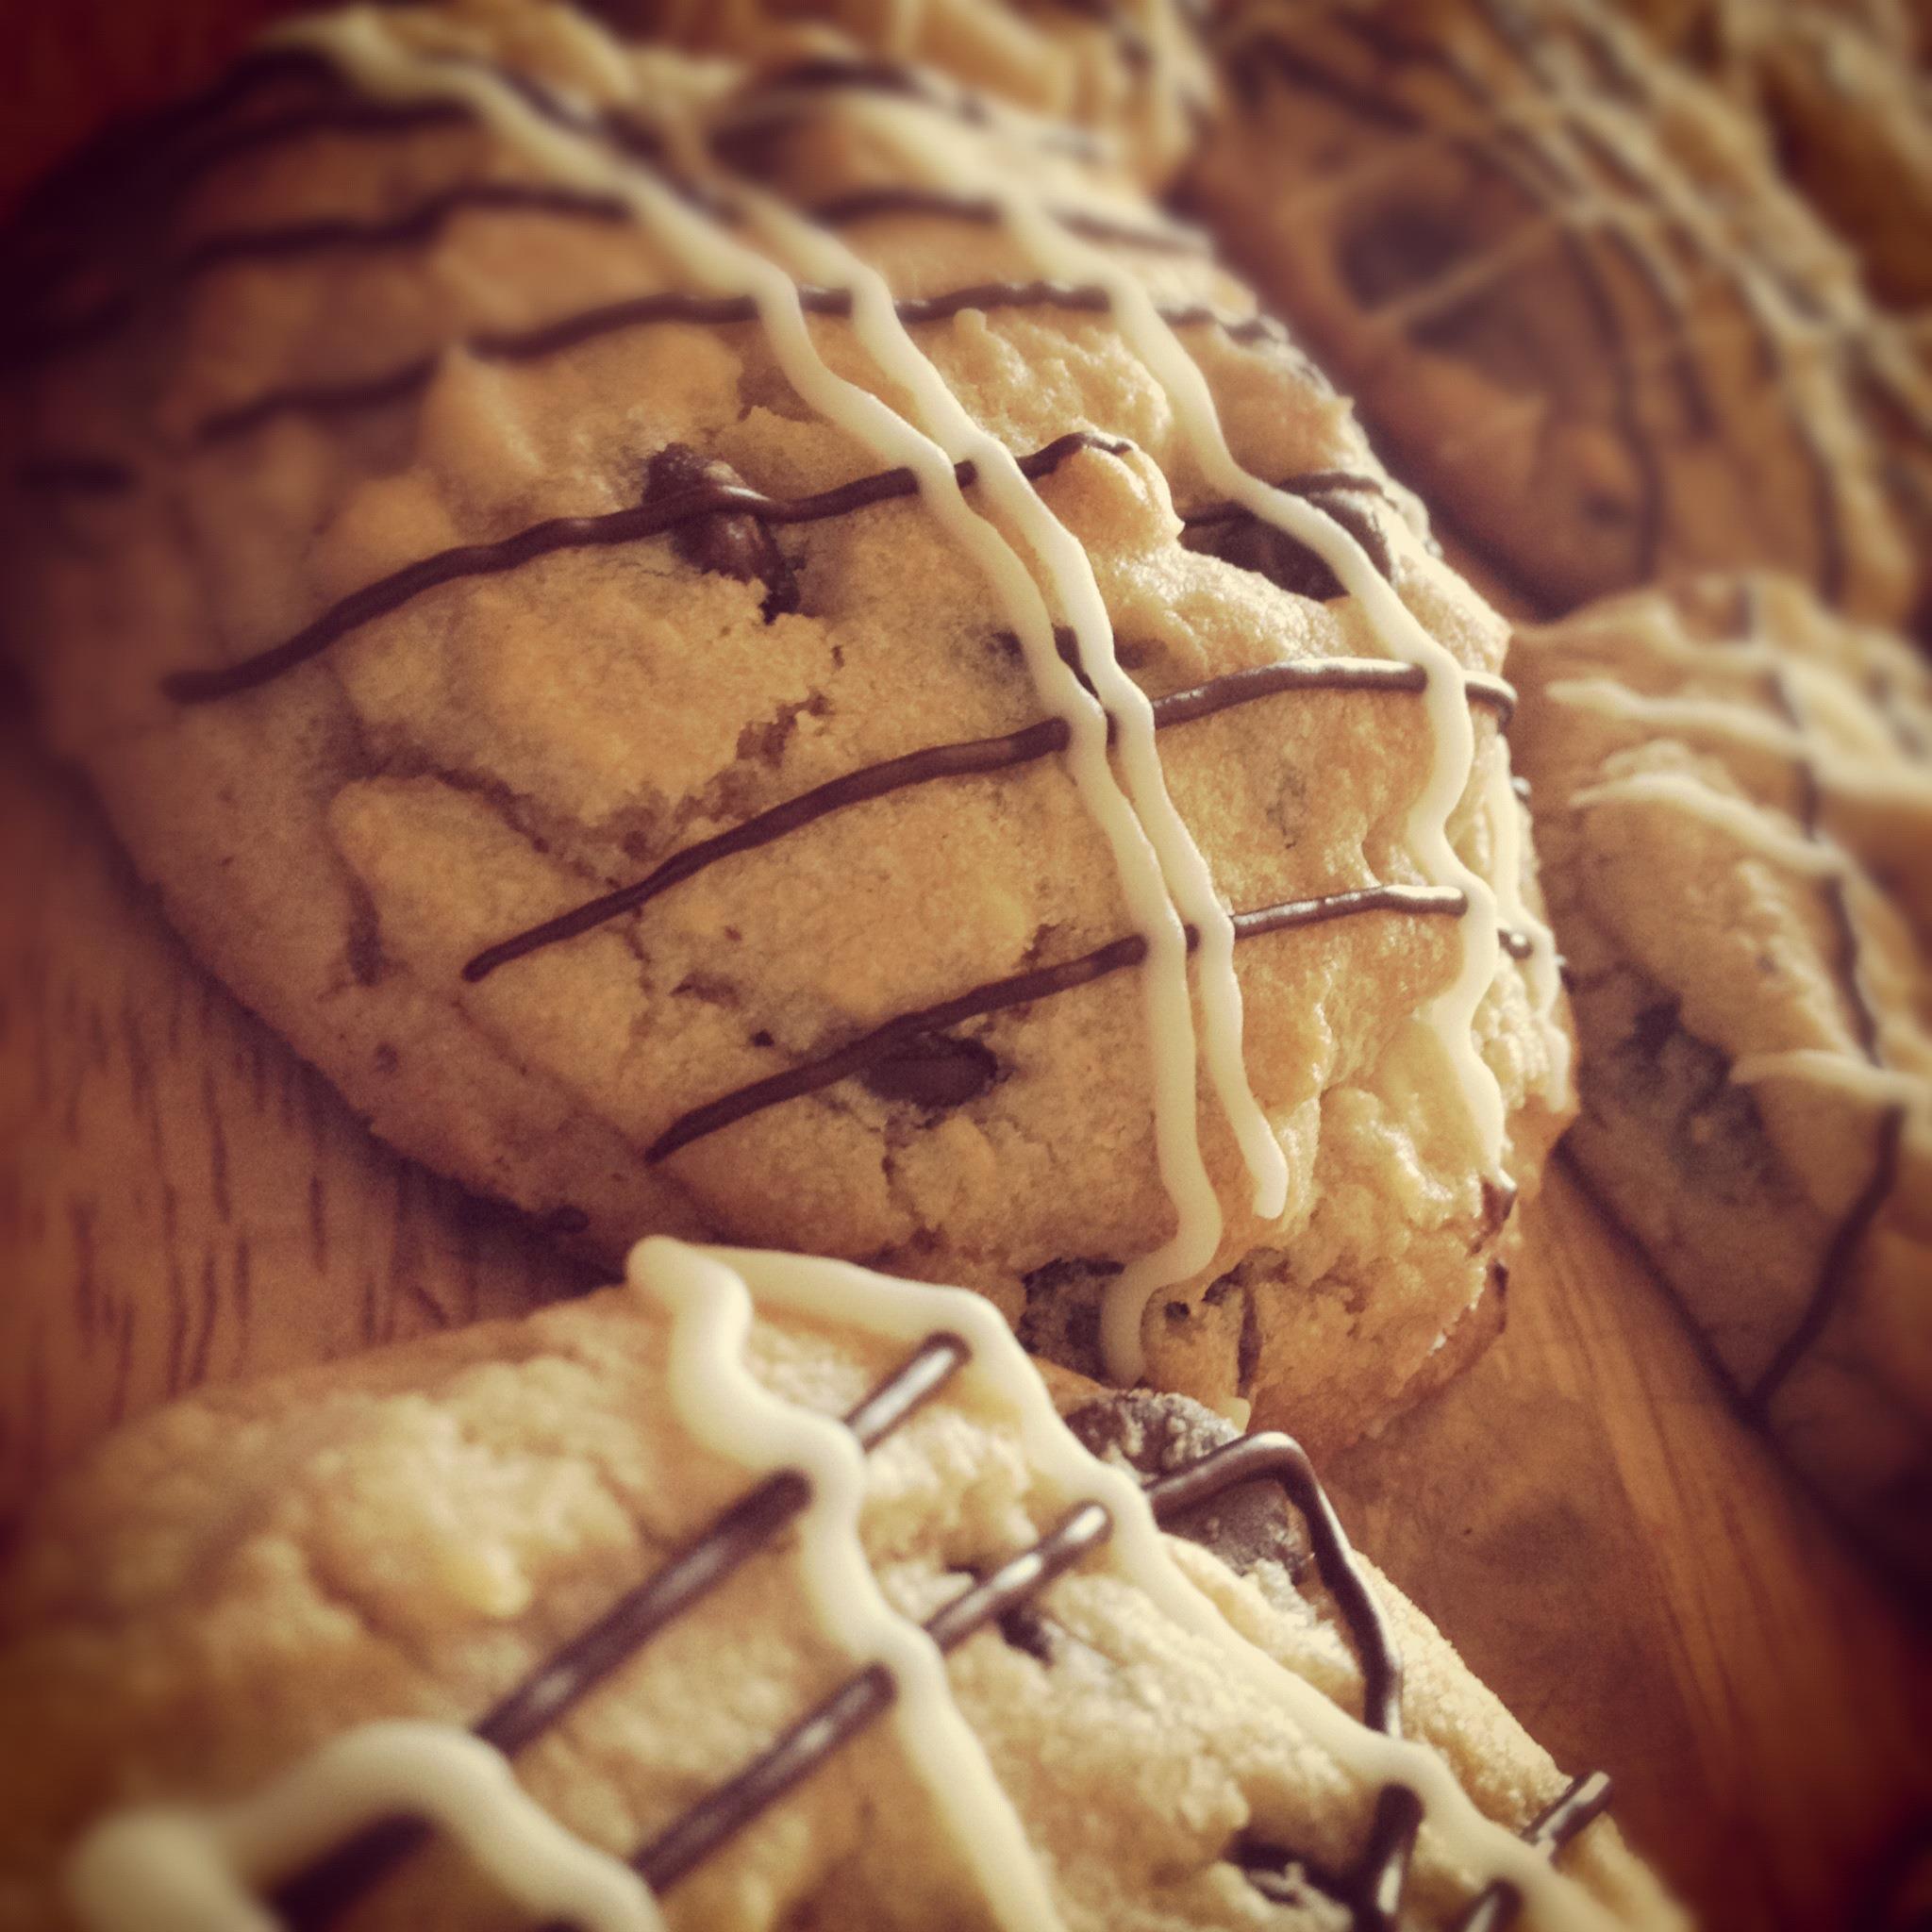 Yum Yum Bakery - image 2 - student project